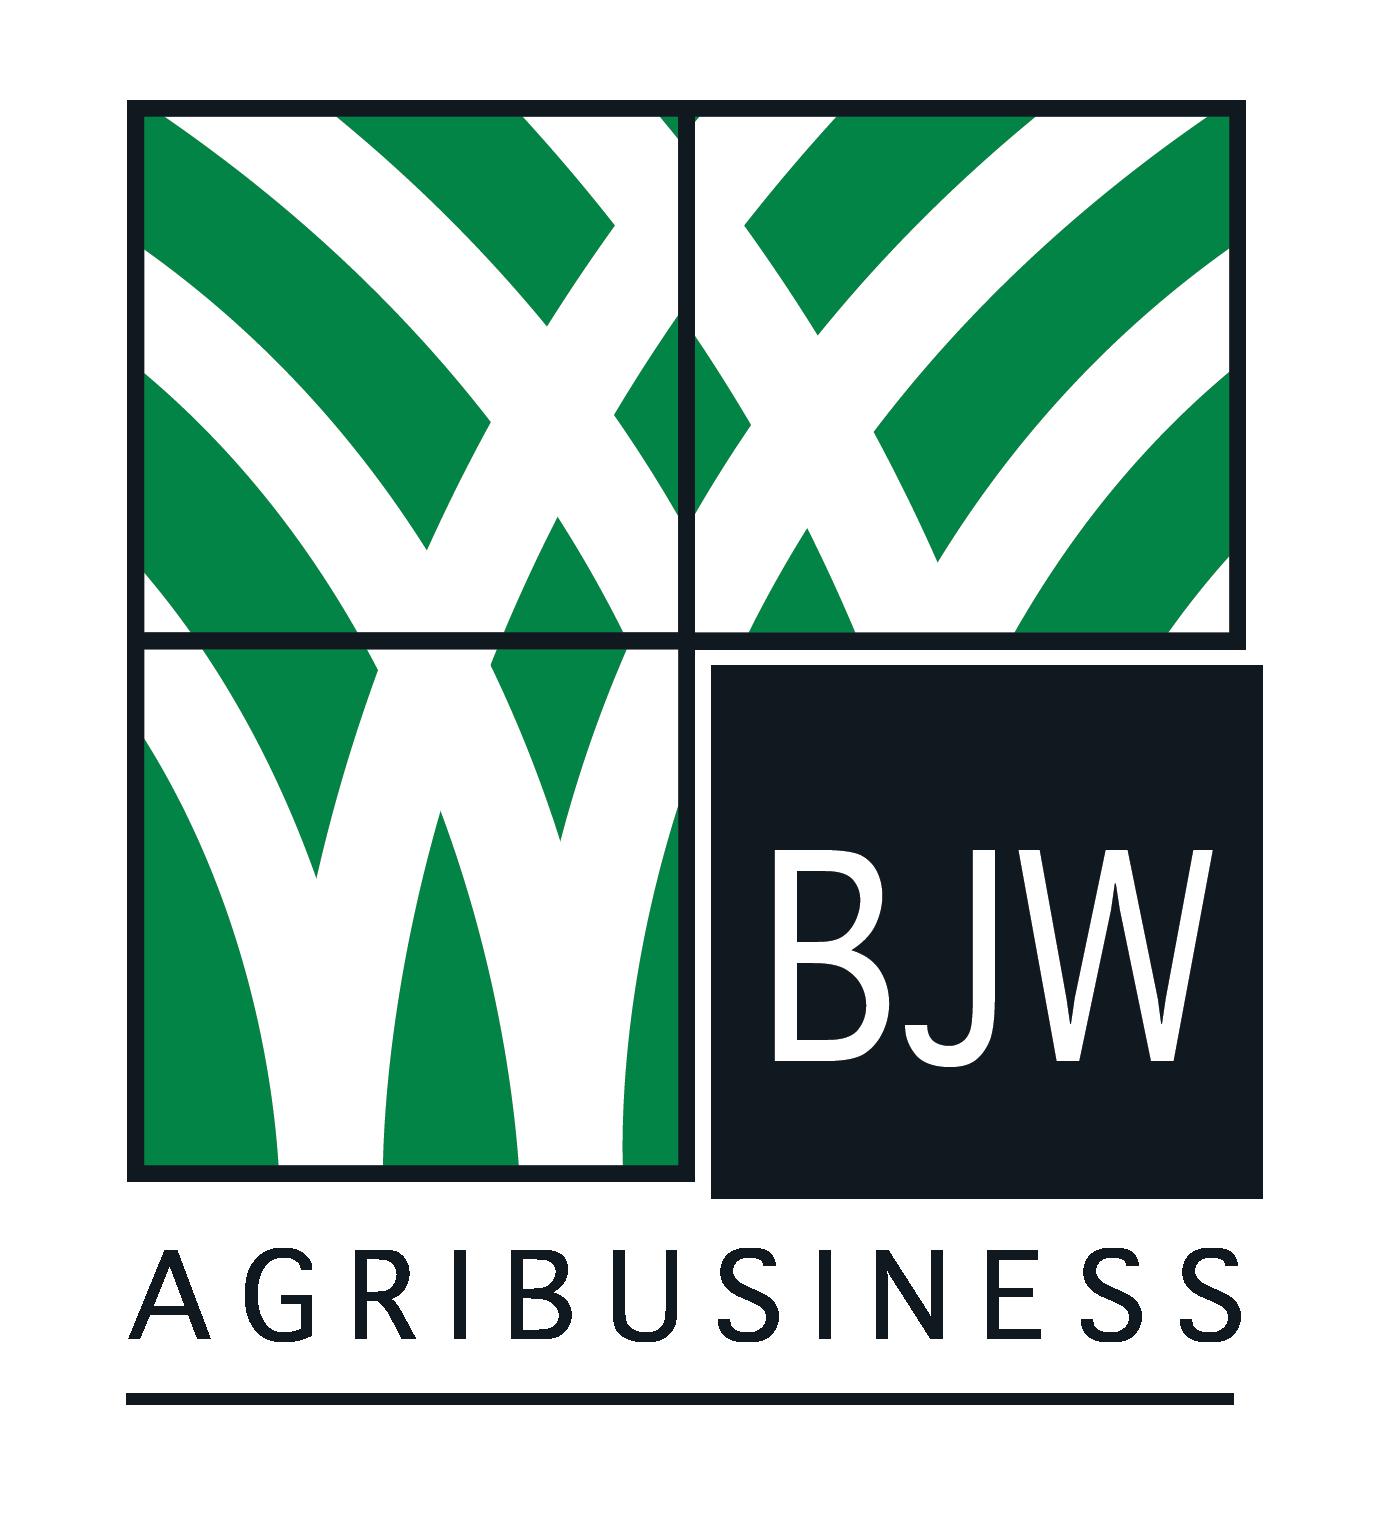 BJW AgriBusiness